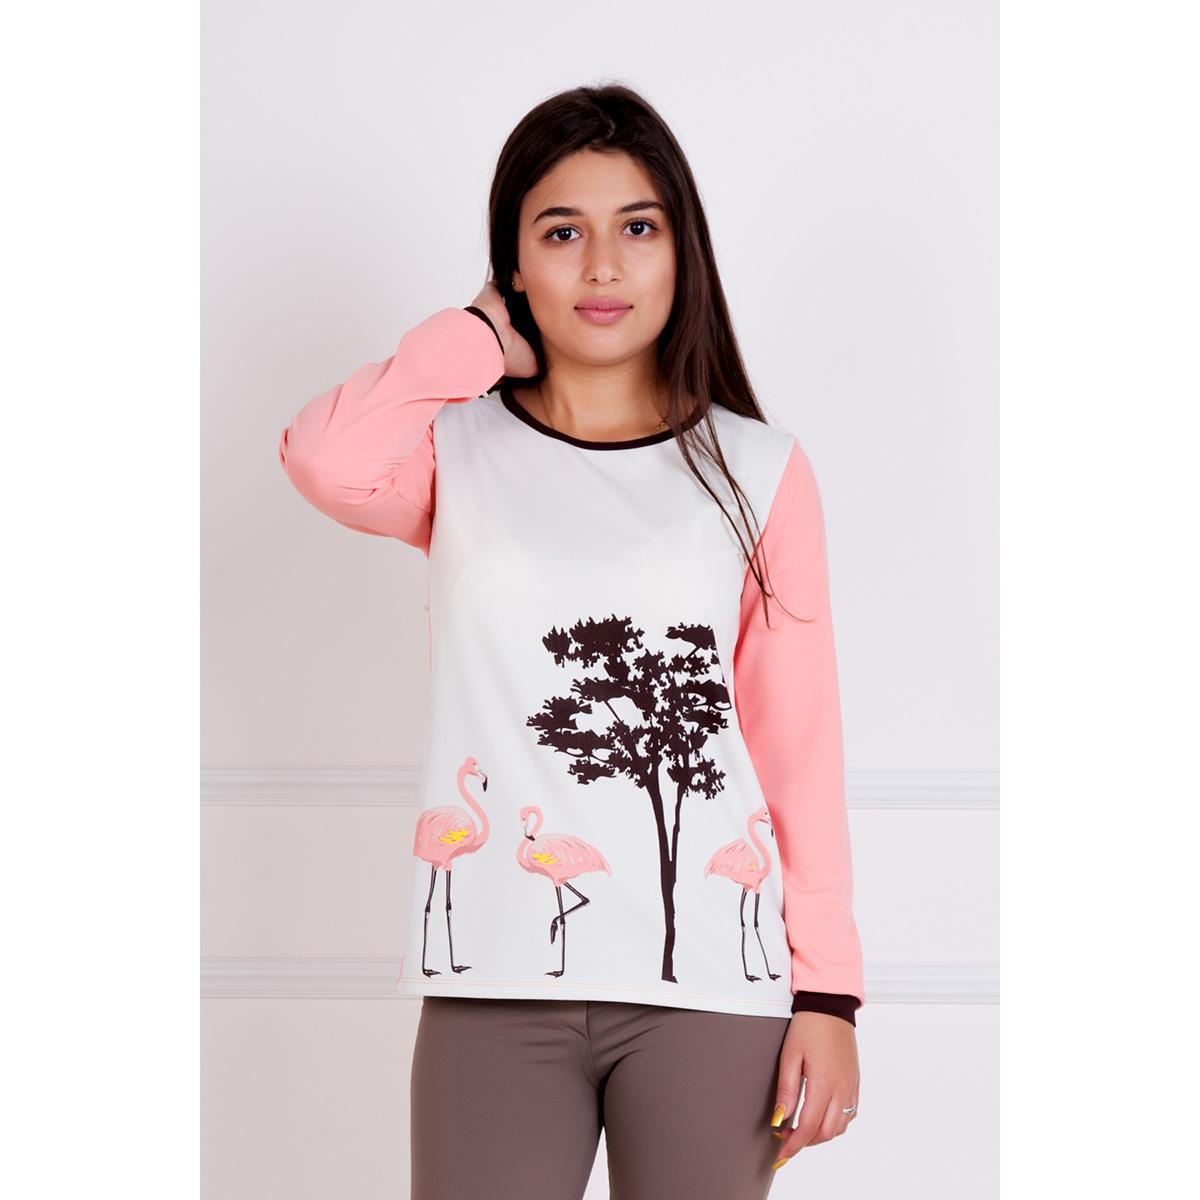 Женская блуза Фламинго, размер 46Блузы<br>Обхват груди:92 см<br>Обхват талии:74 см<br>Обхват бедер:100 см<br>Длина по спинке:66 см<br>Рост:167 см<br><br>Тип: Жен. блуза<br>Размер: 46<br>Материал: Креп